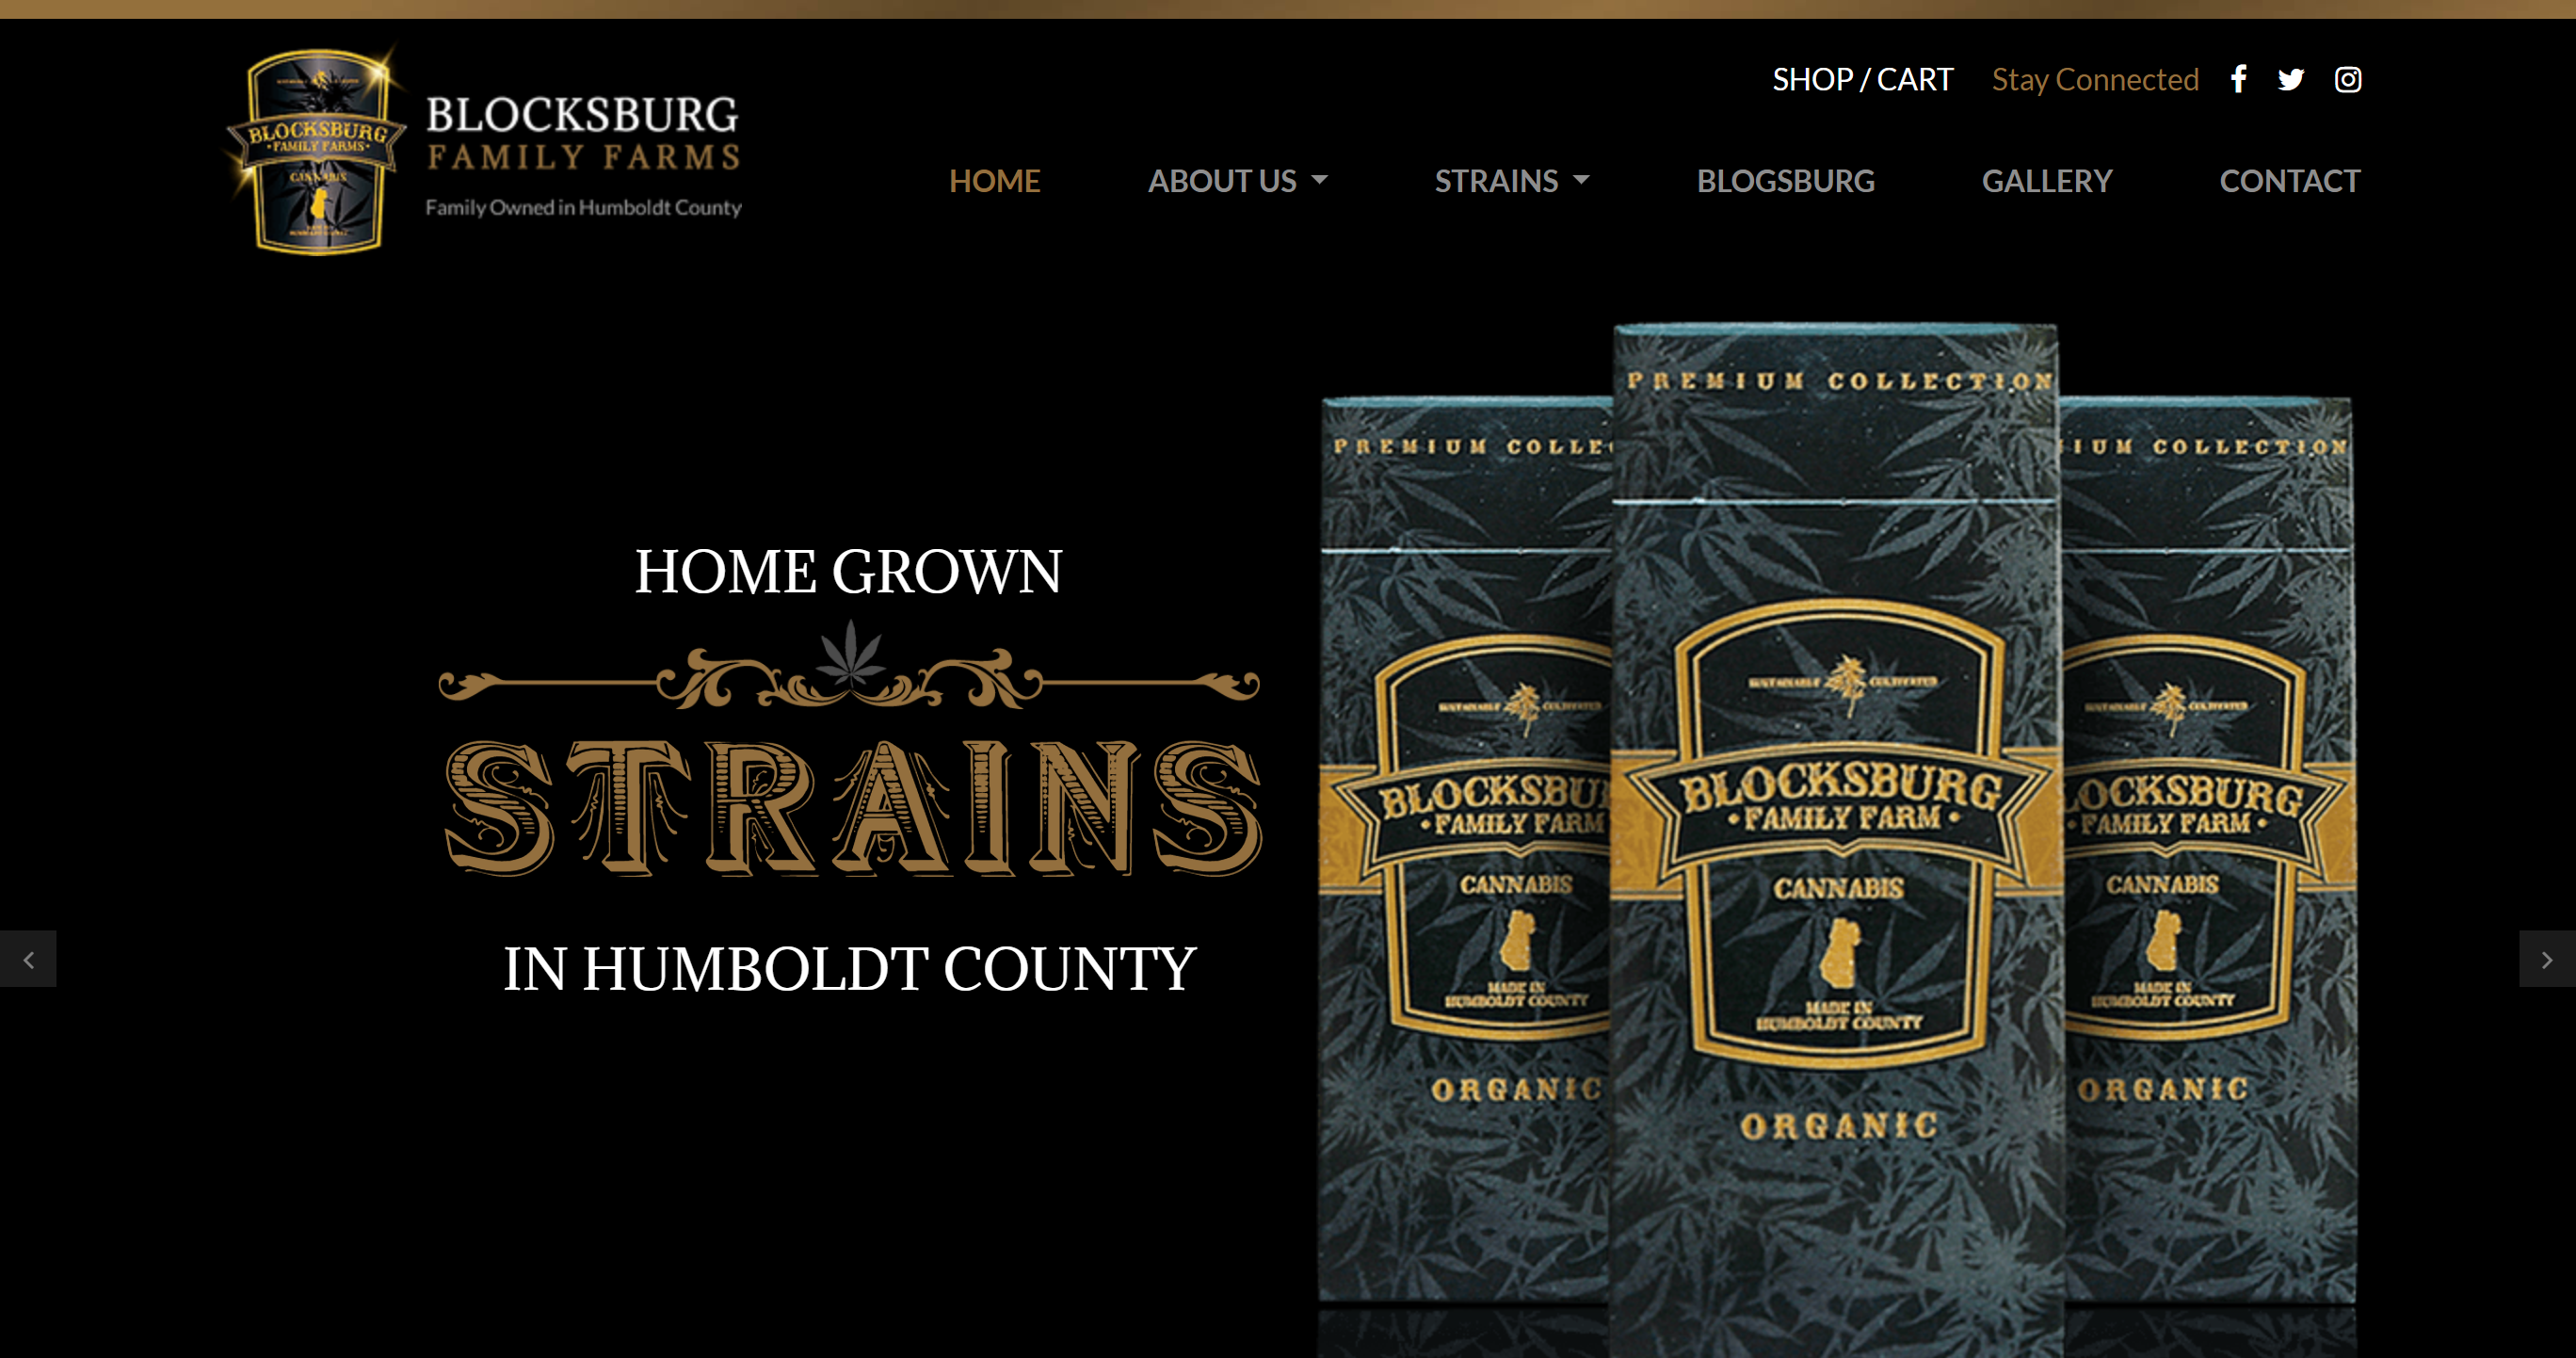 Blocksburg Site Image